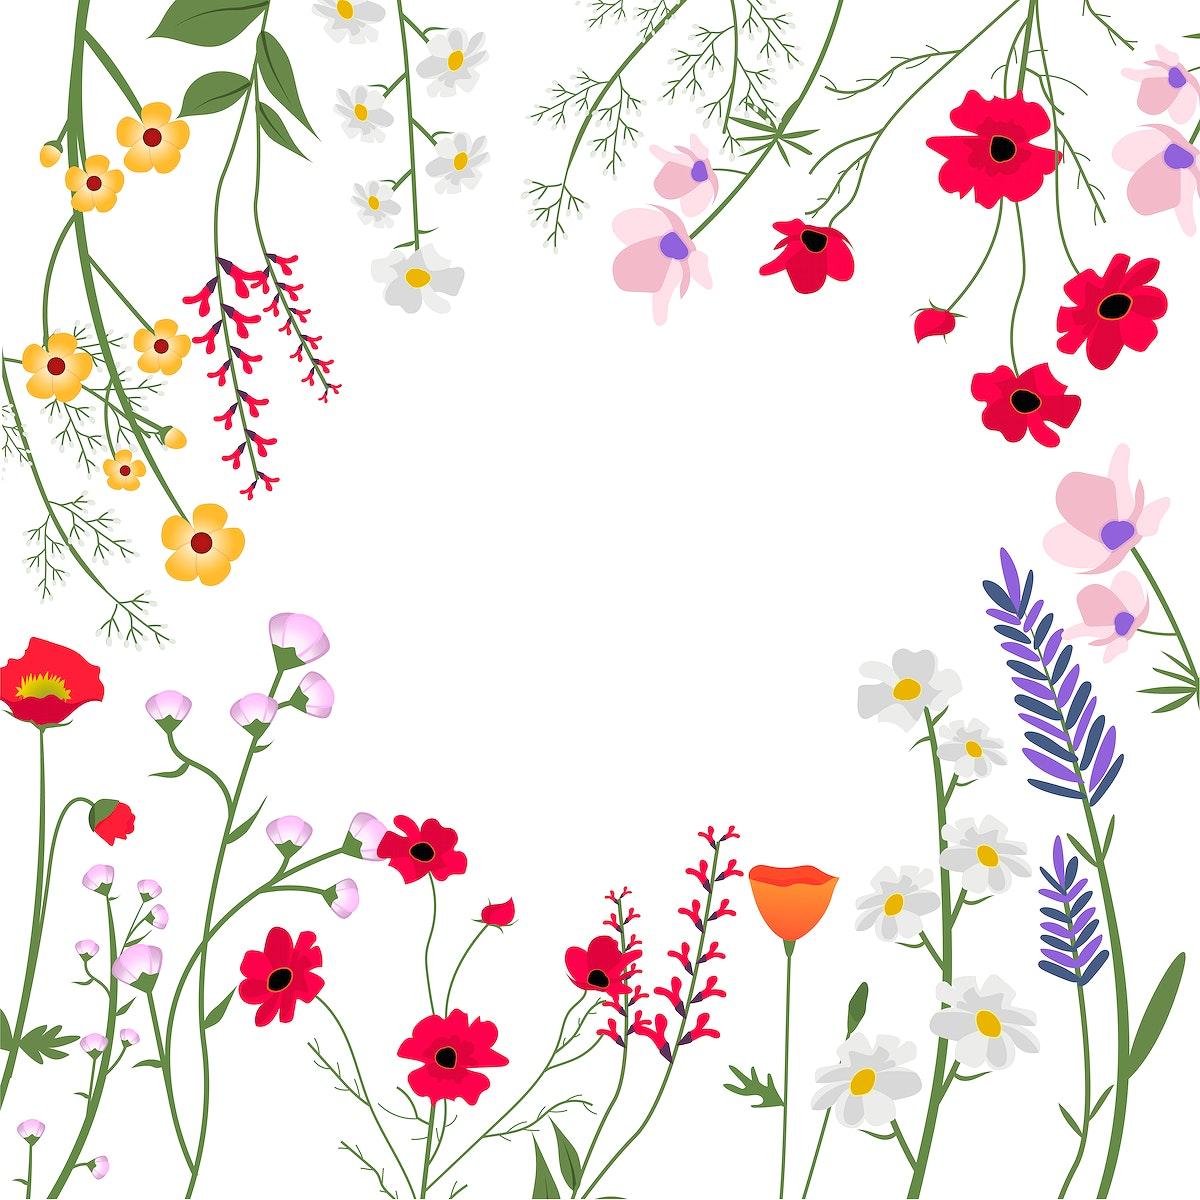 Wild Flowers Vector Illustration